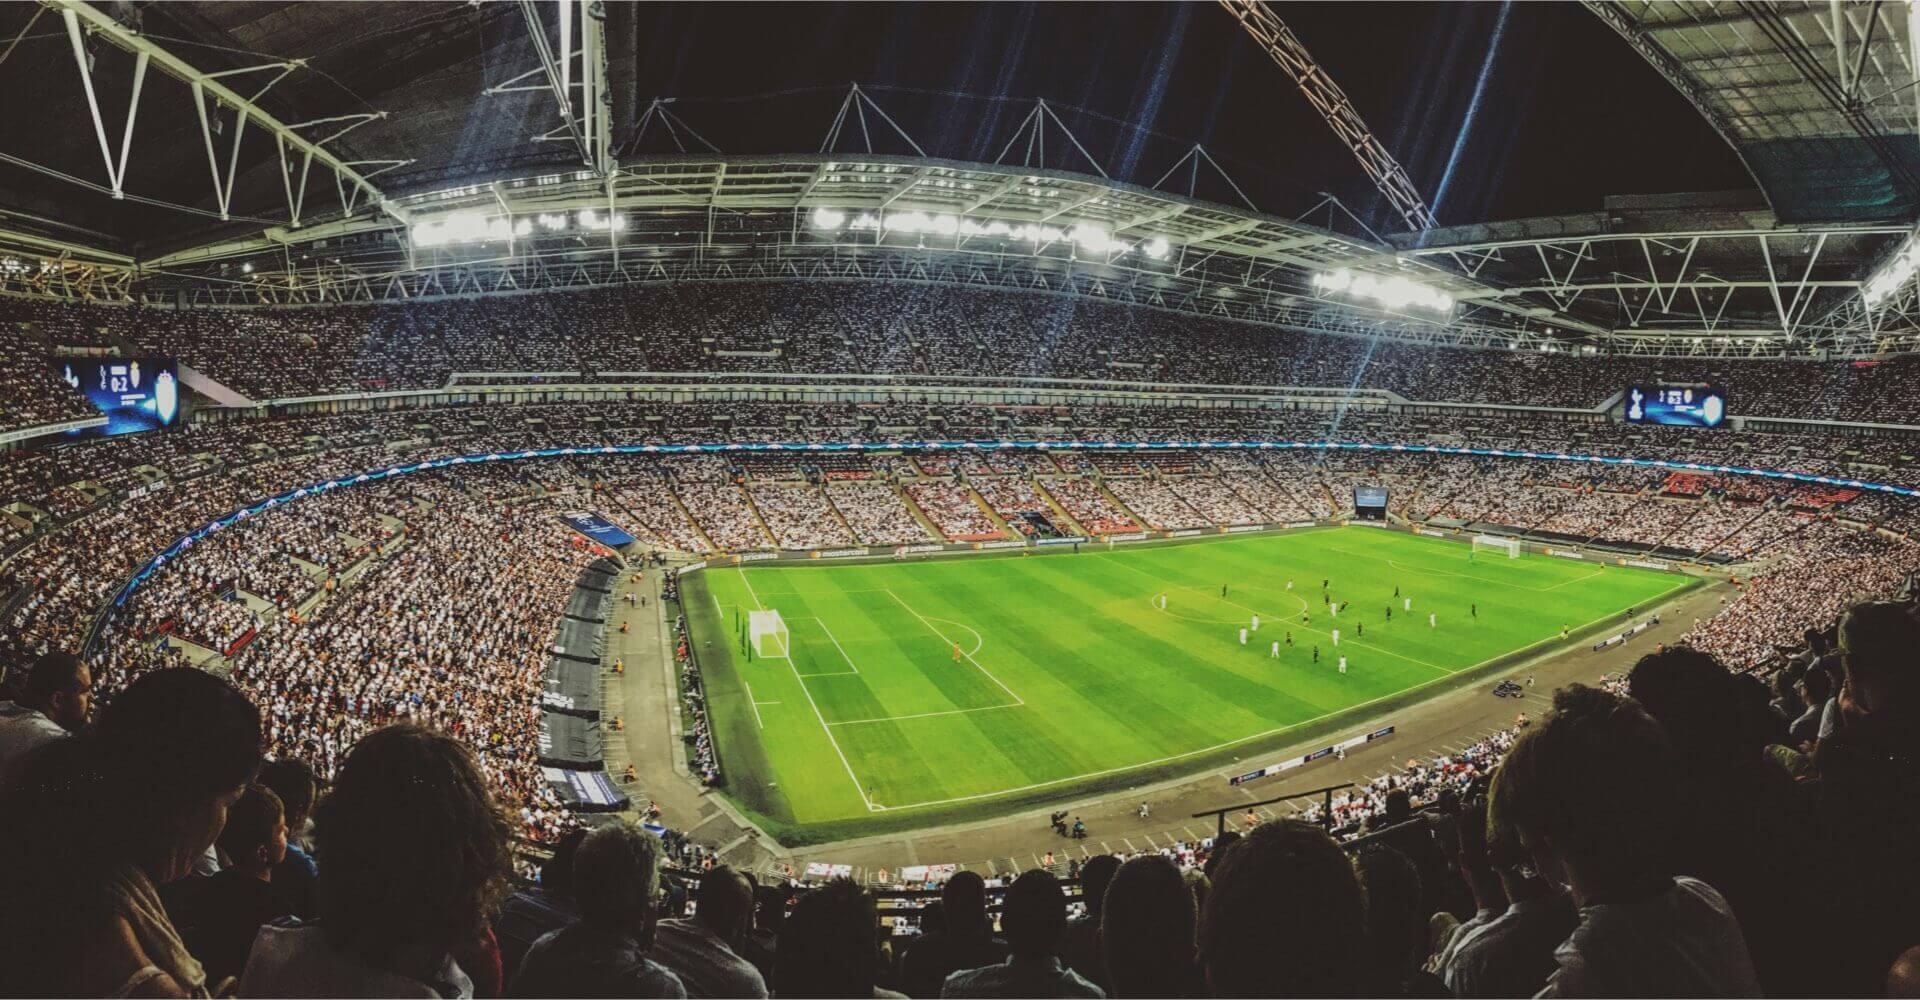 SMS - Sportsmedia & sponsorship